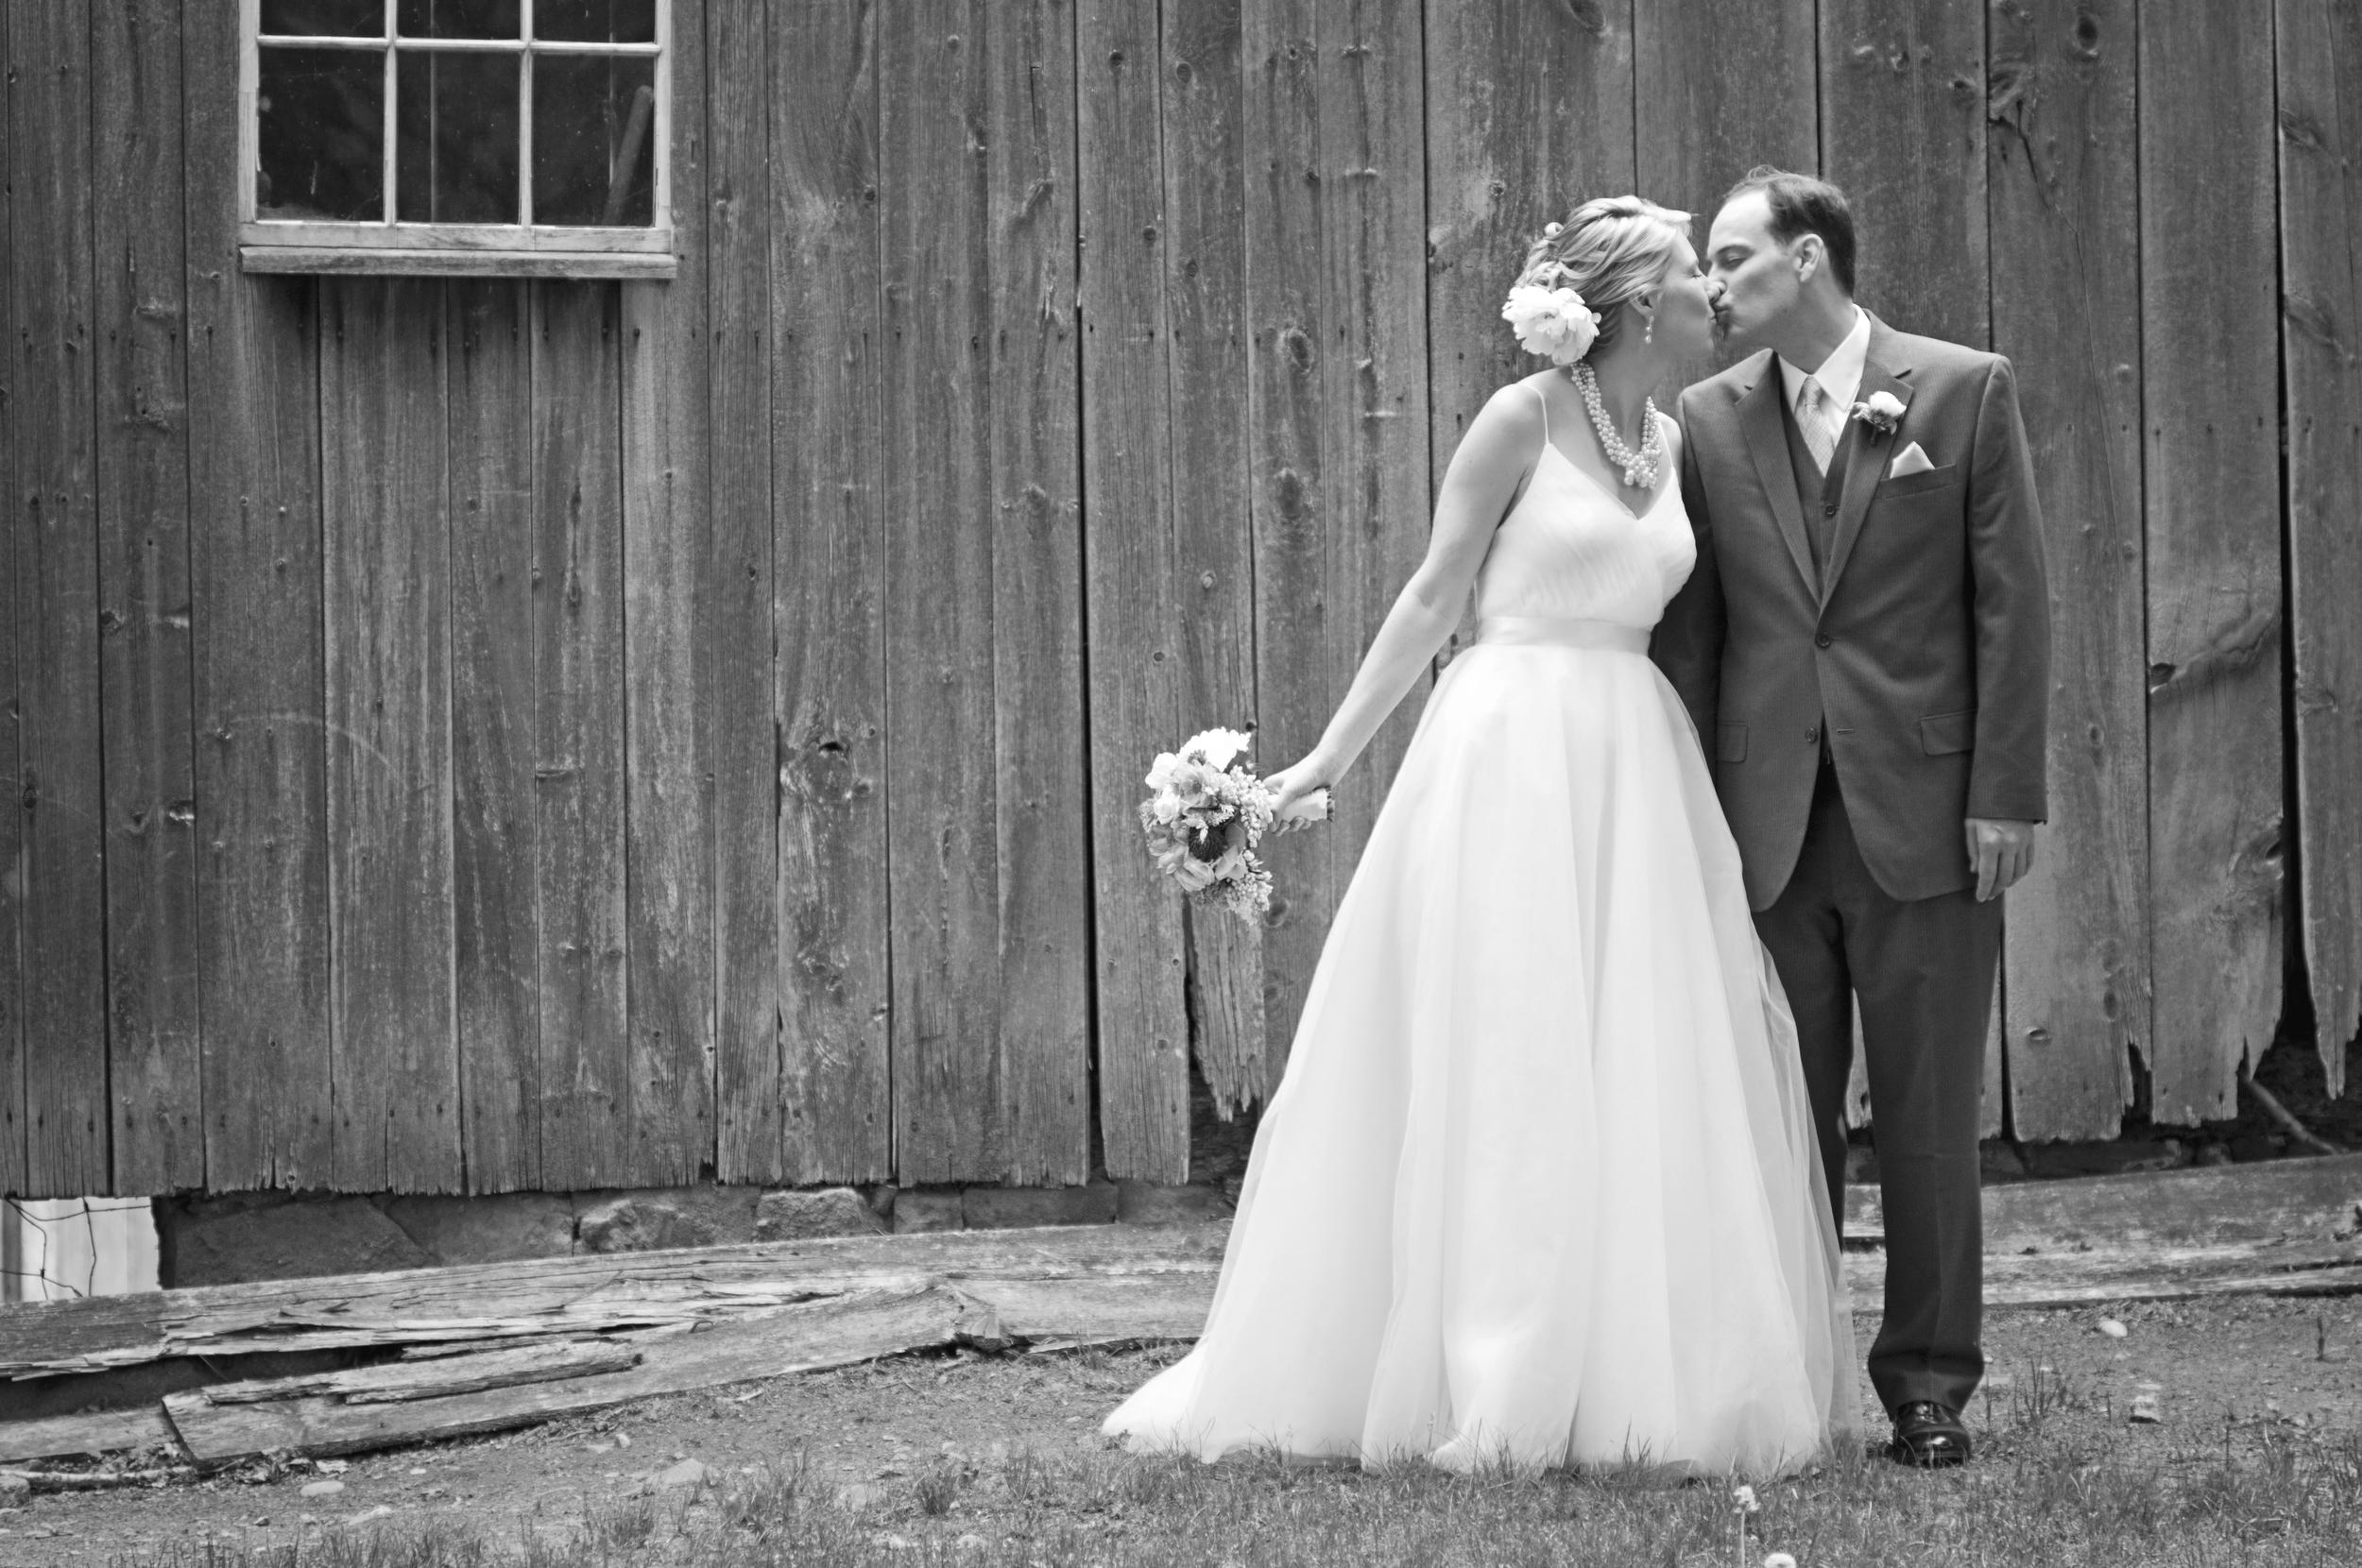 Angela_Chicoski_CT_wedding_photographer_107.jpg